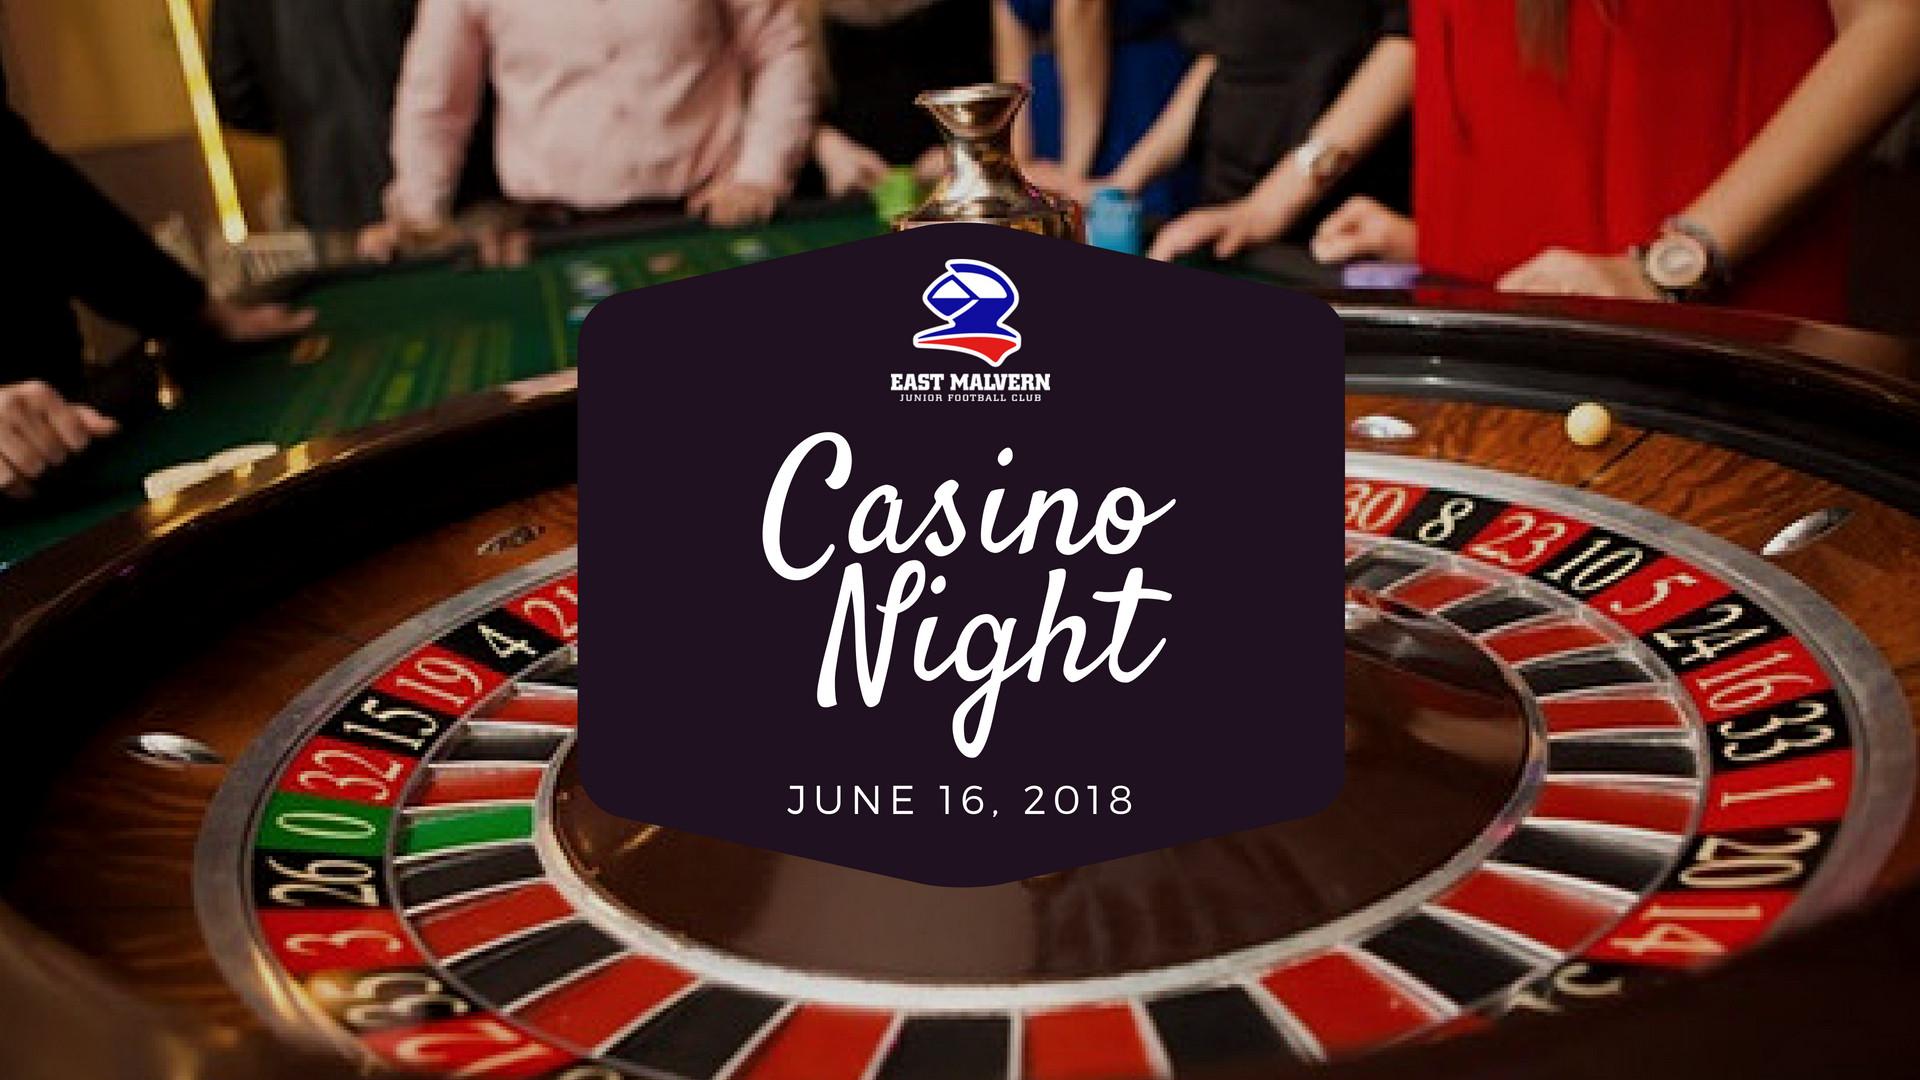 Knights Casino Night